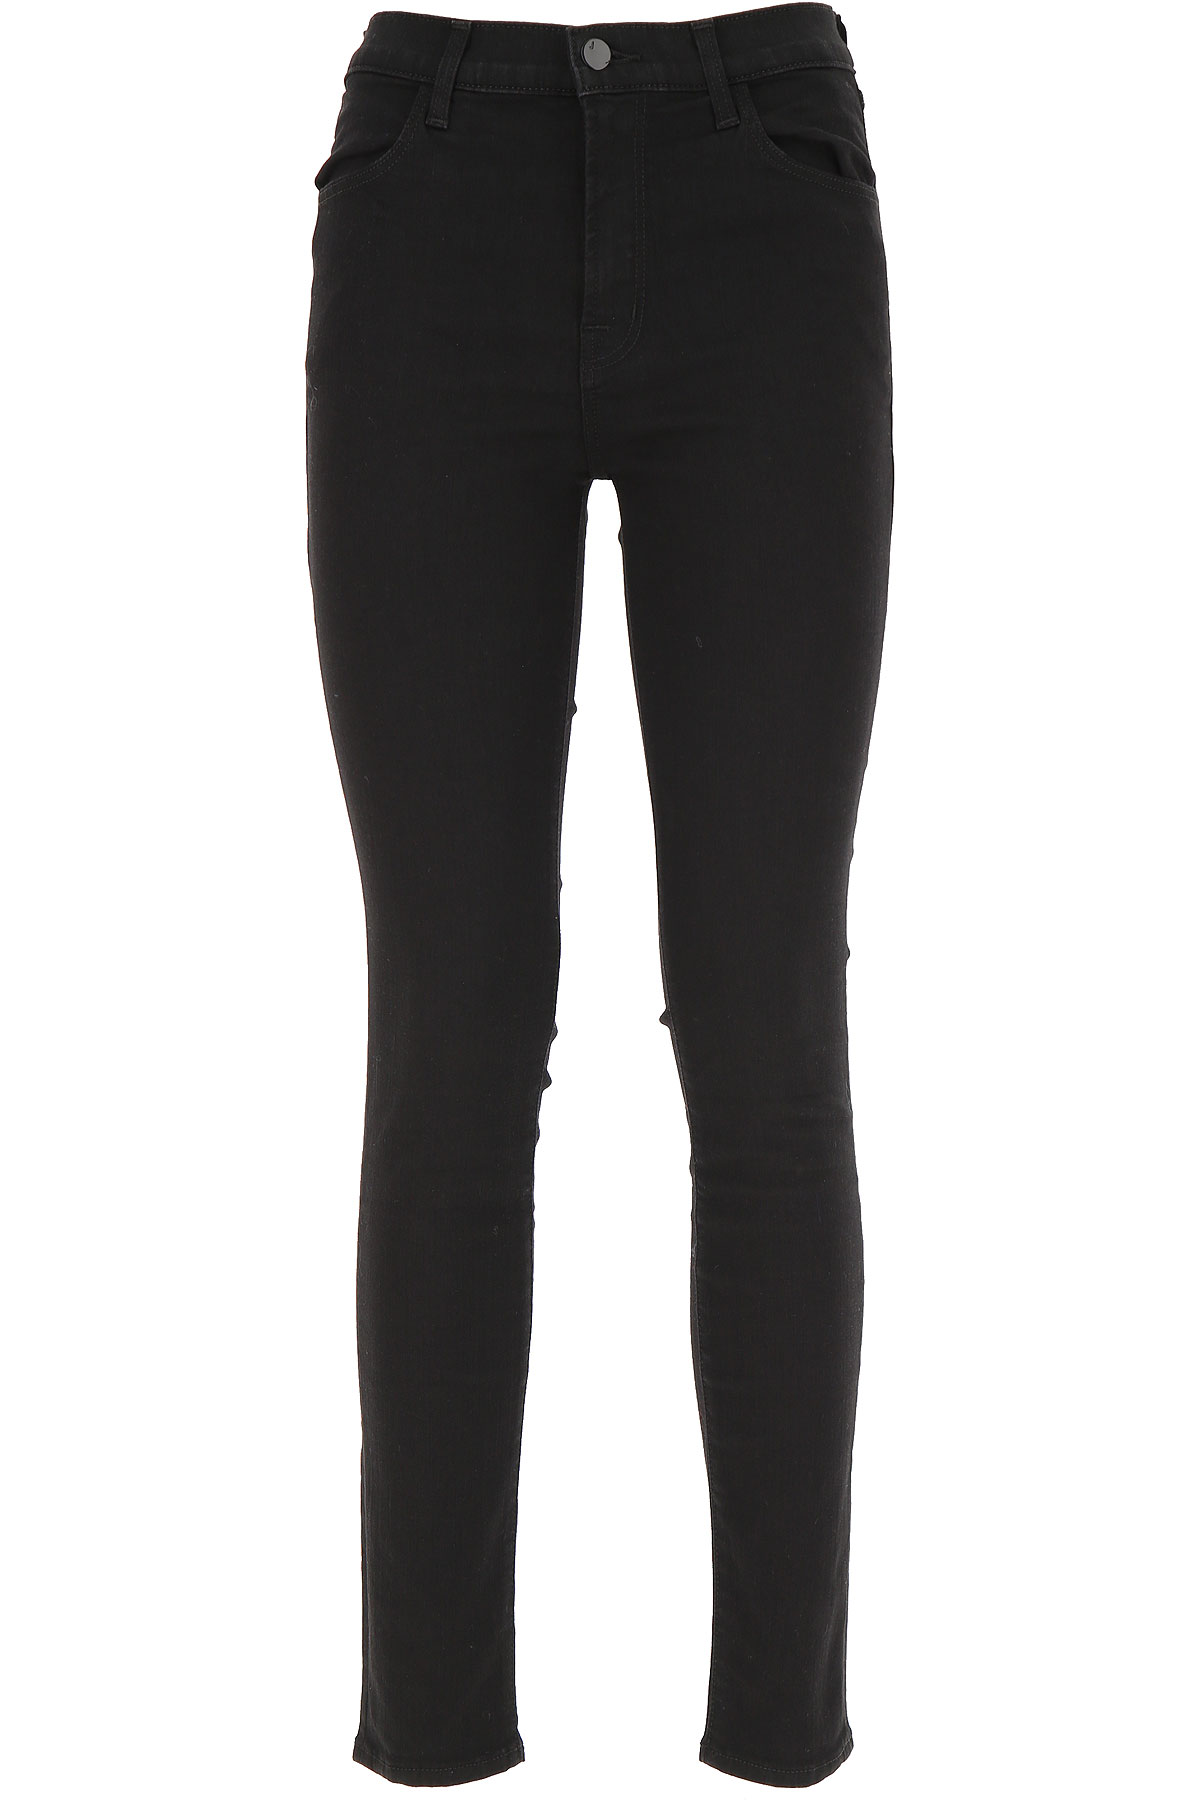 J Brand Jeans On Sale, Black, Cotton, 2019, 29 30